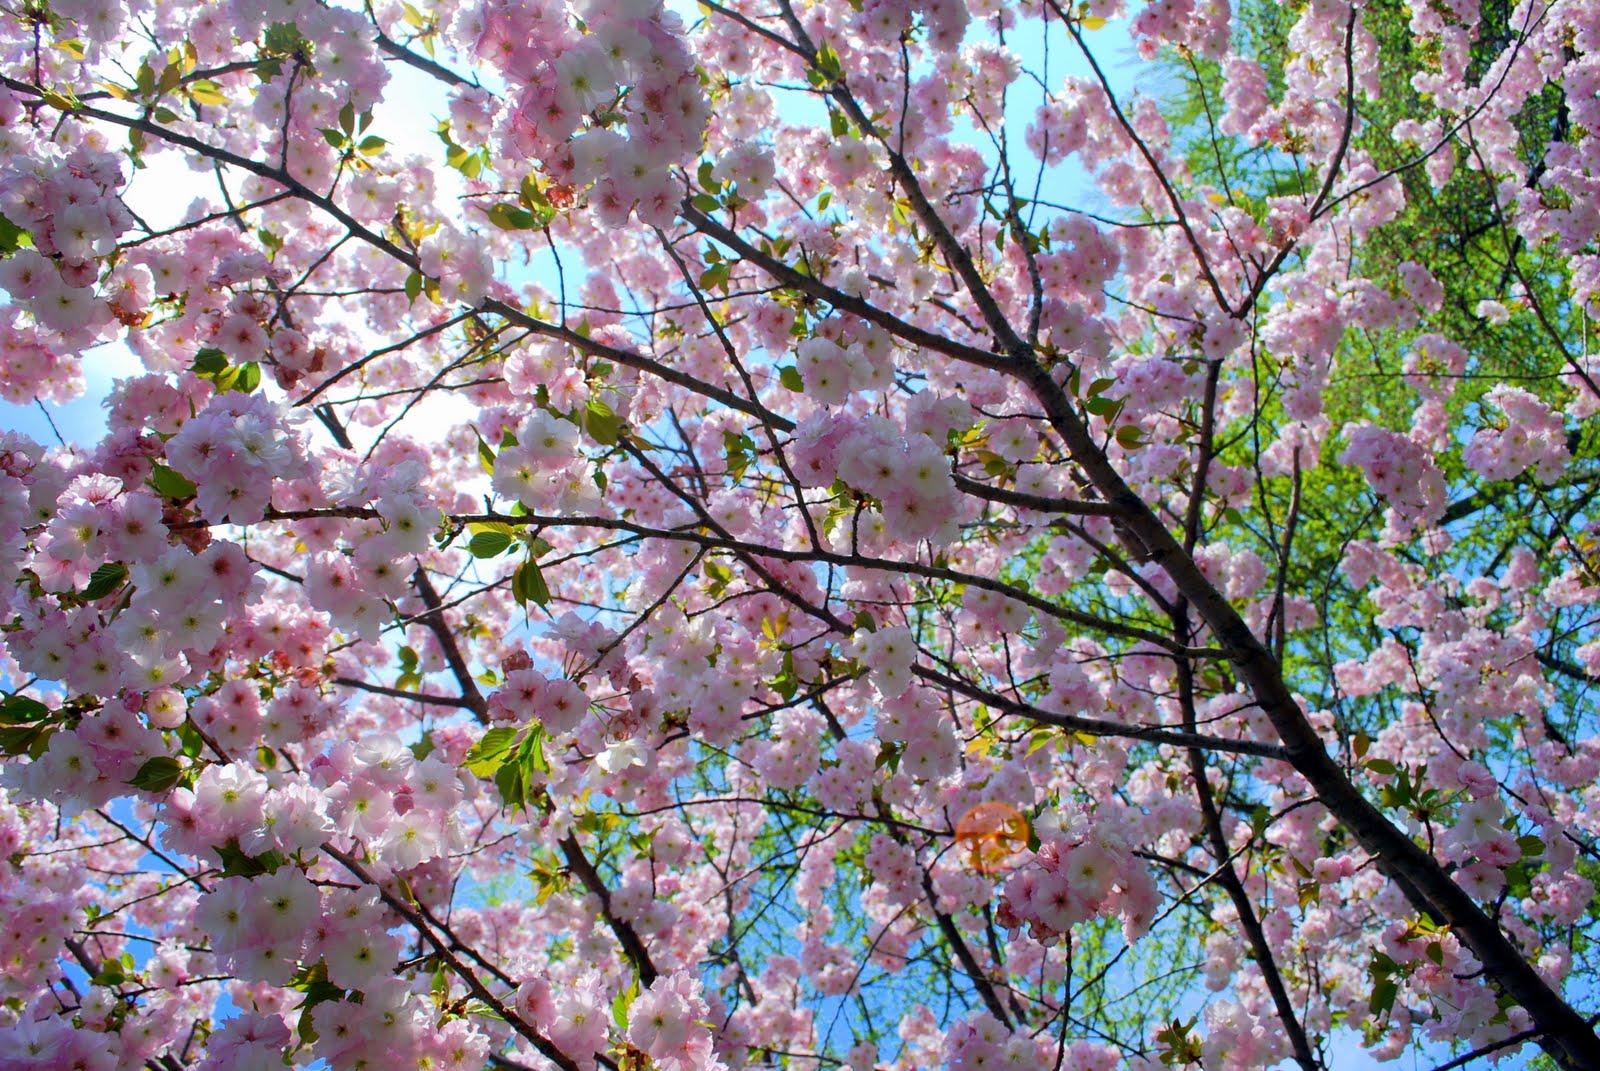 mille fiori favoriti cherry blossom time at the brooklyn